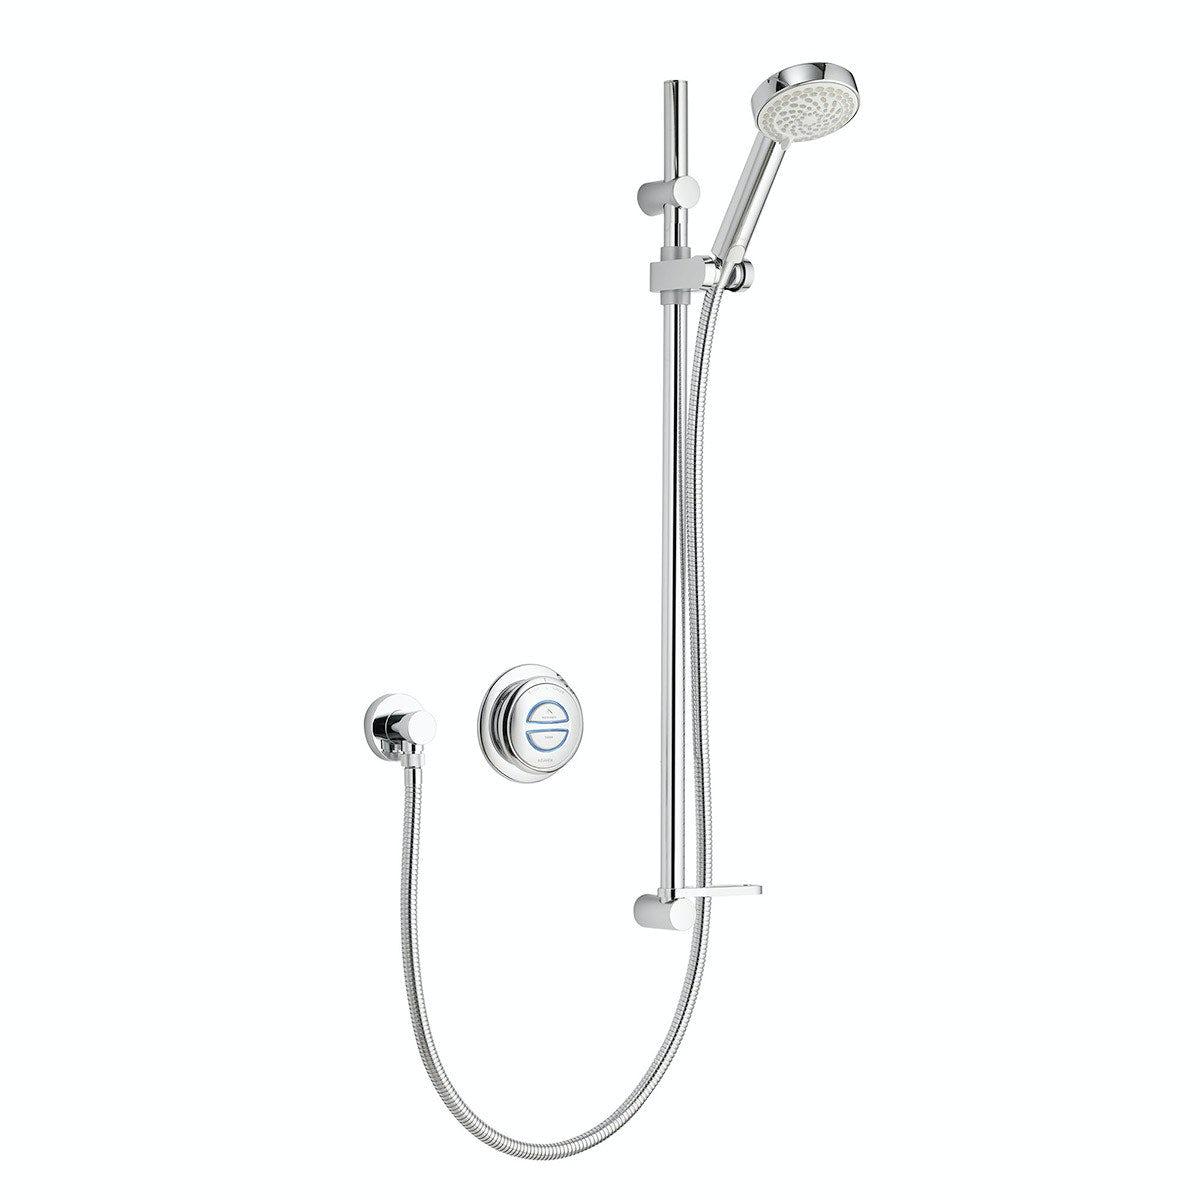 Aqualisa quartz concealed digital shower pumped